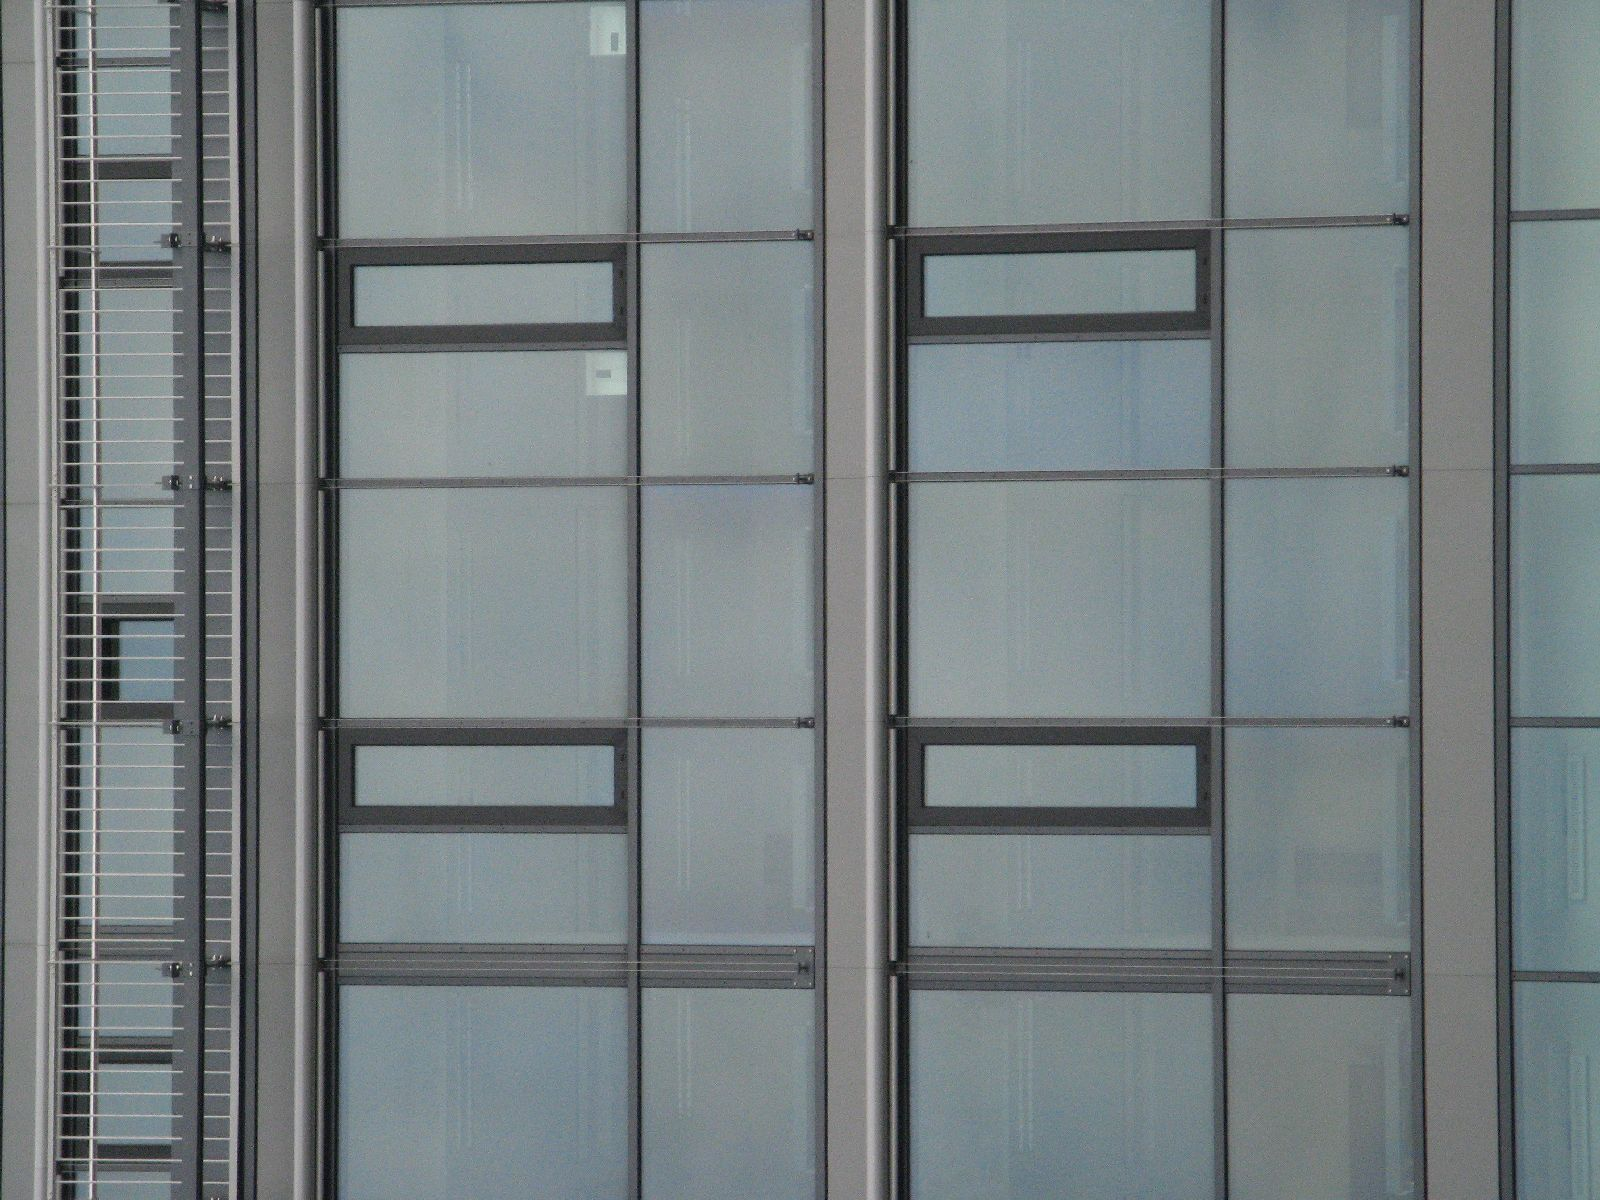 Building_Texture_B_3611